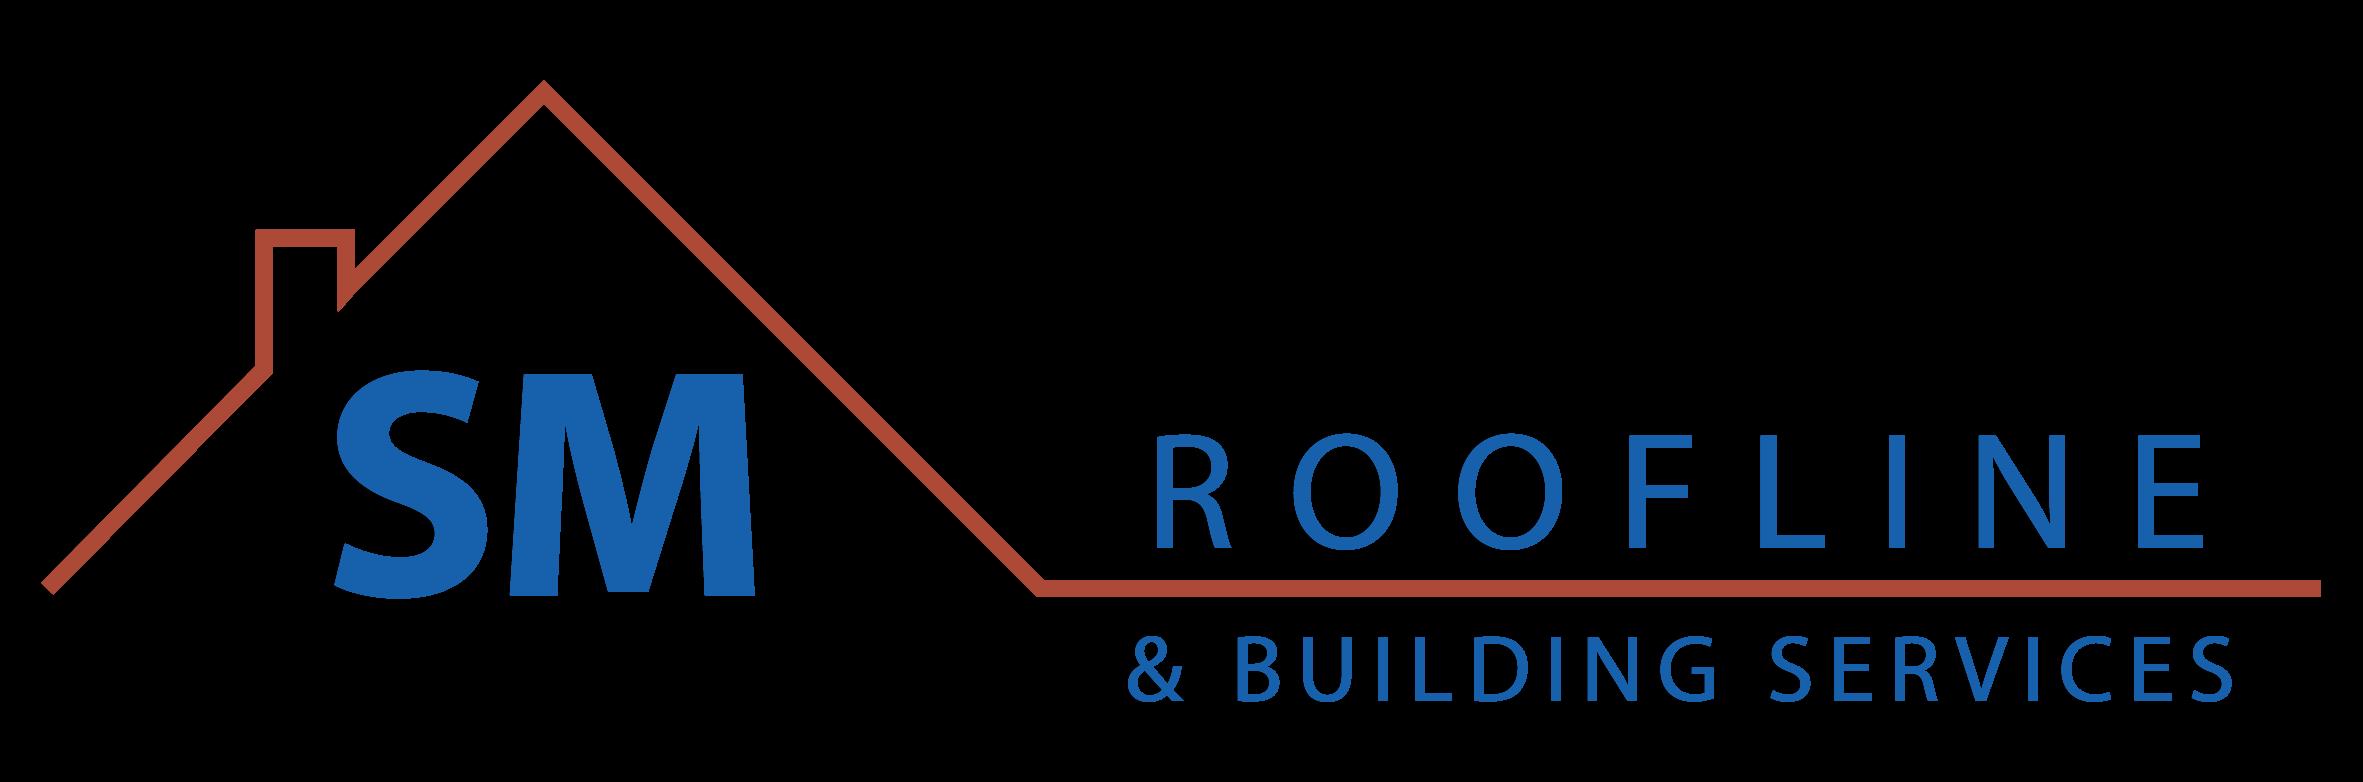 SM Roofline